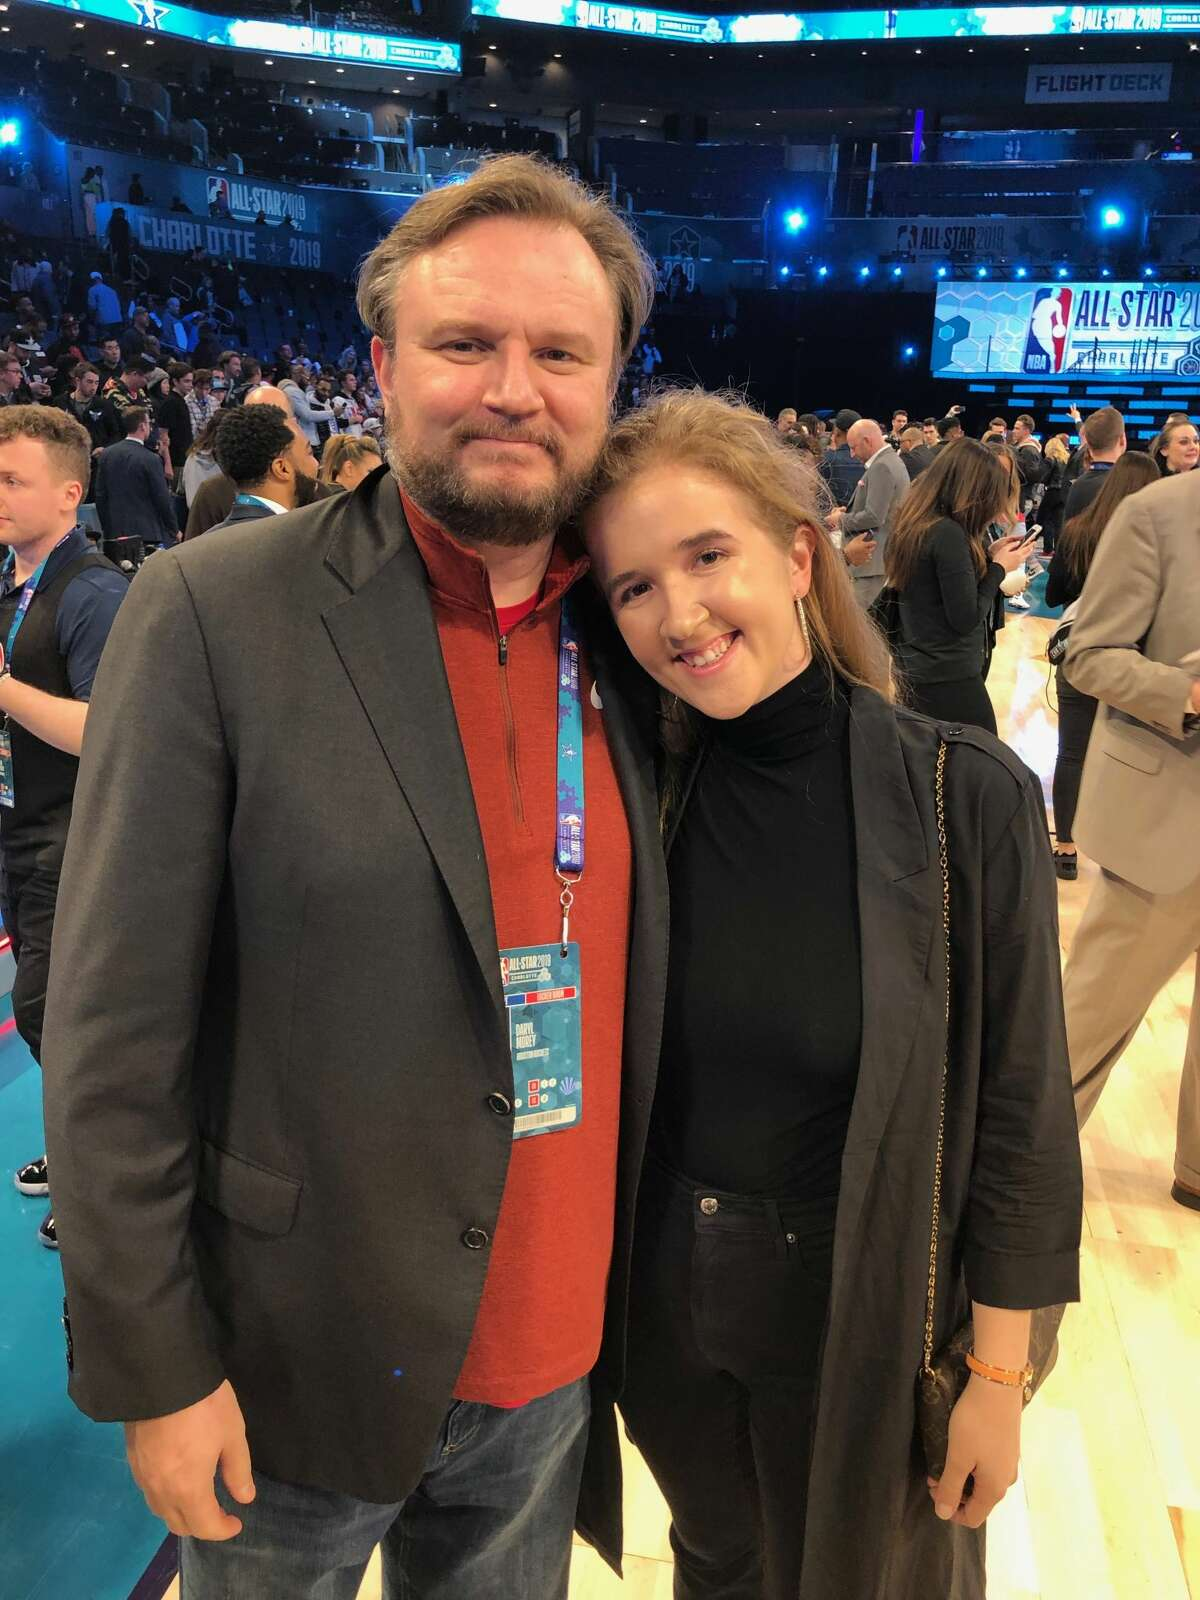 Daryl Morey with his daughter, Karen Morey.